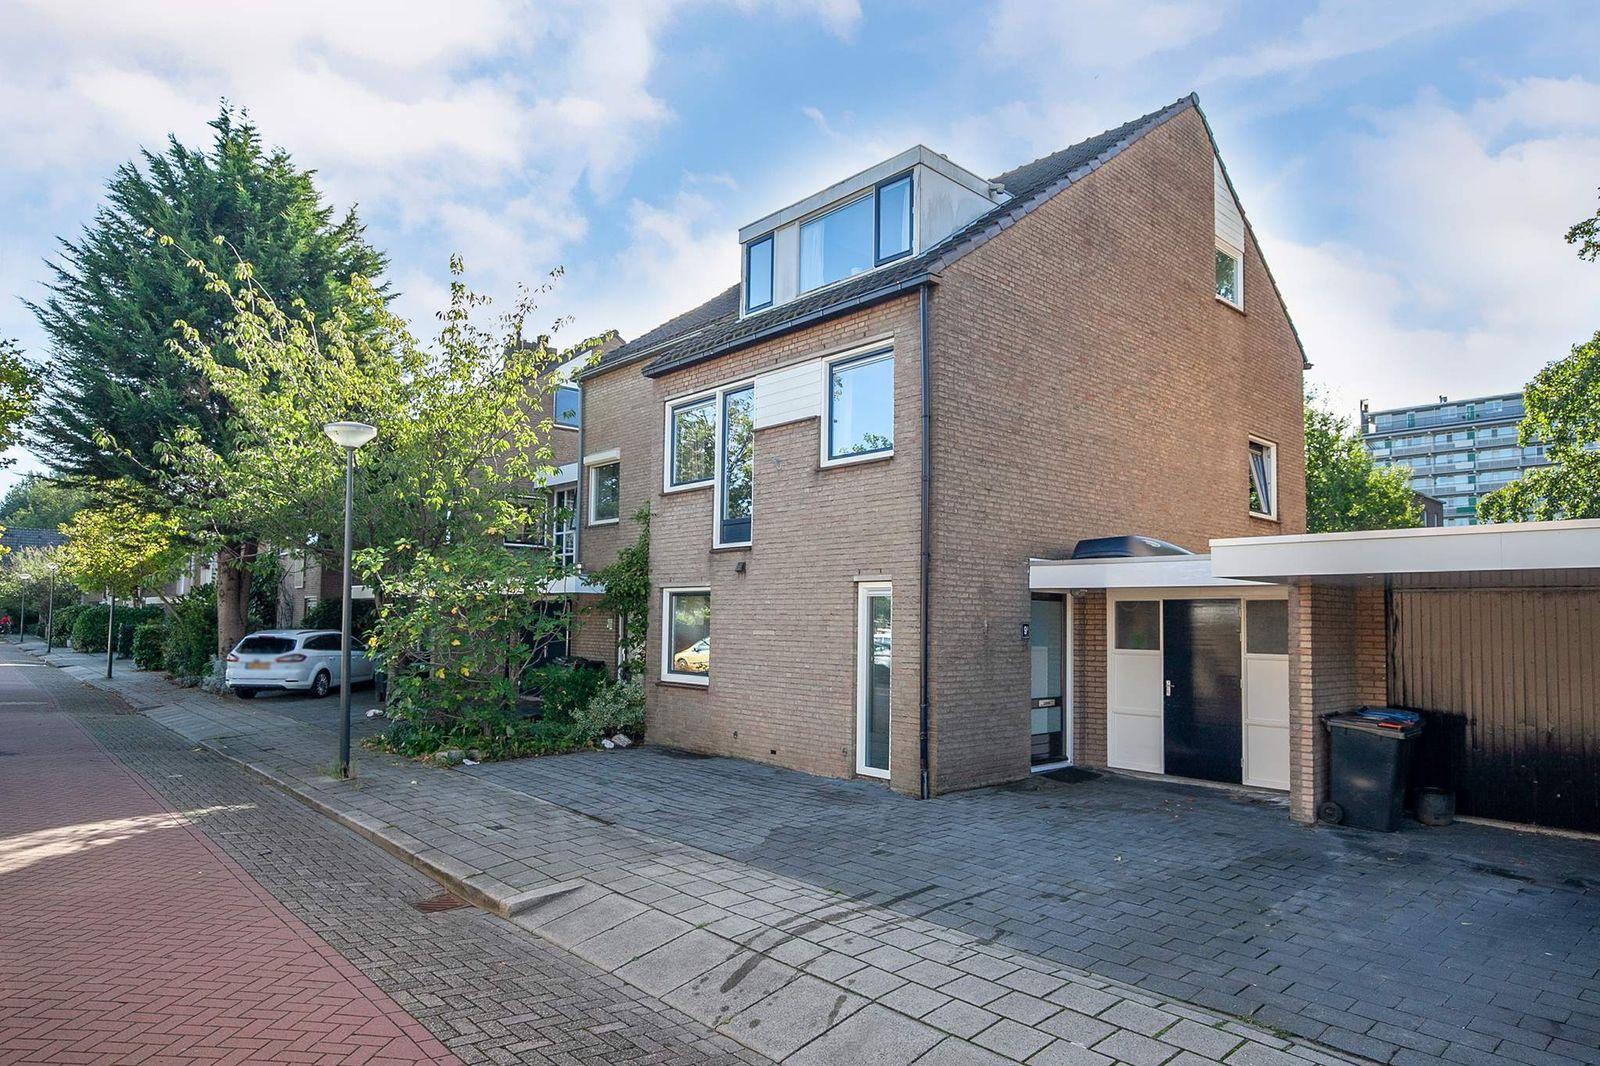 Heijermansplein 9B, Schiedam